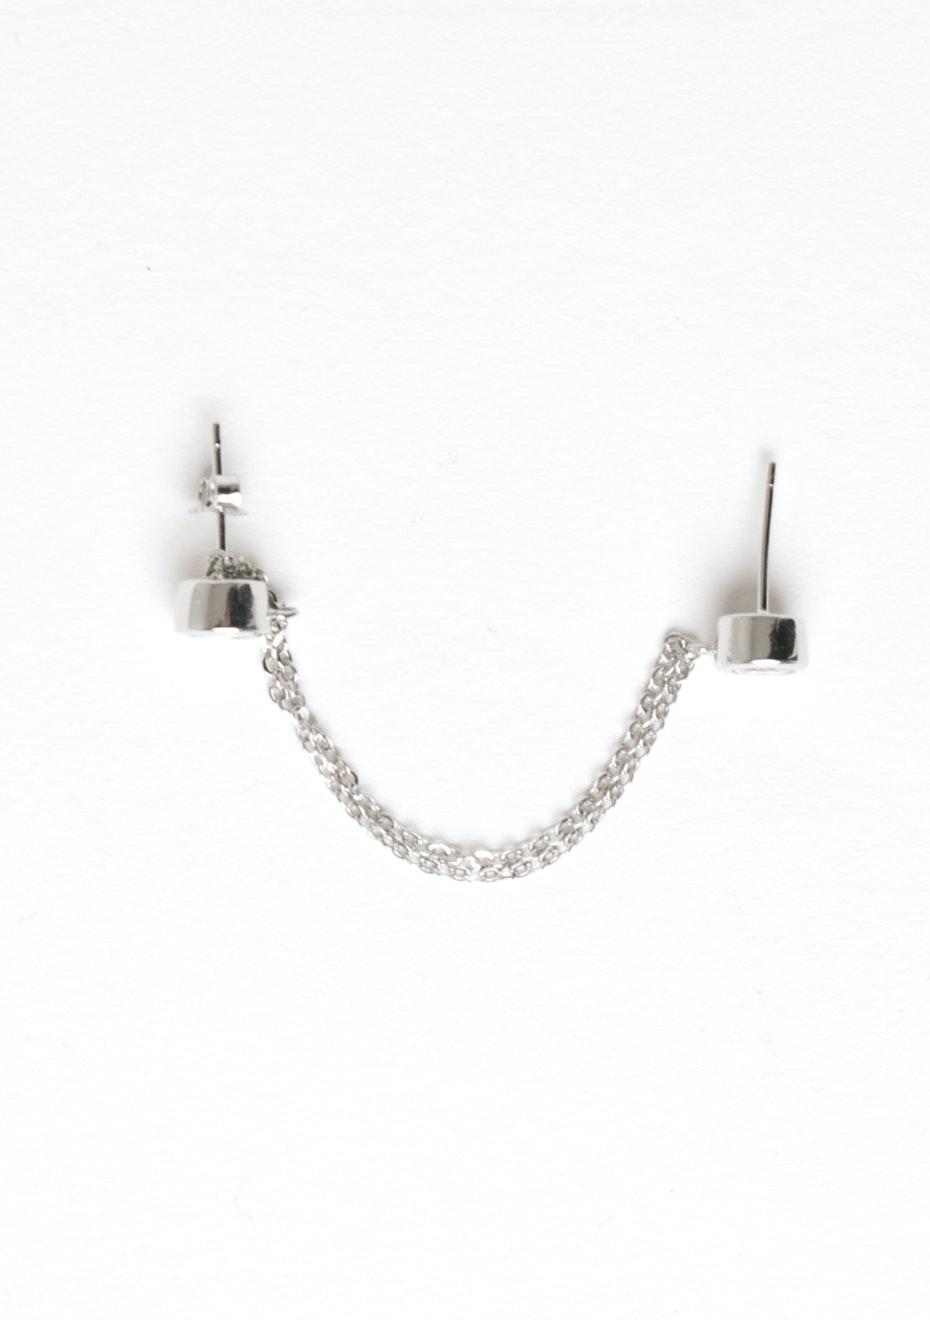 Dia Chain Drop Cuff - 925 Silver